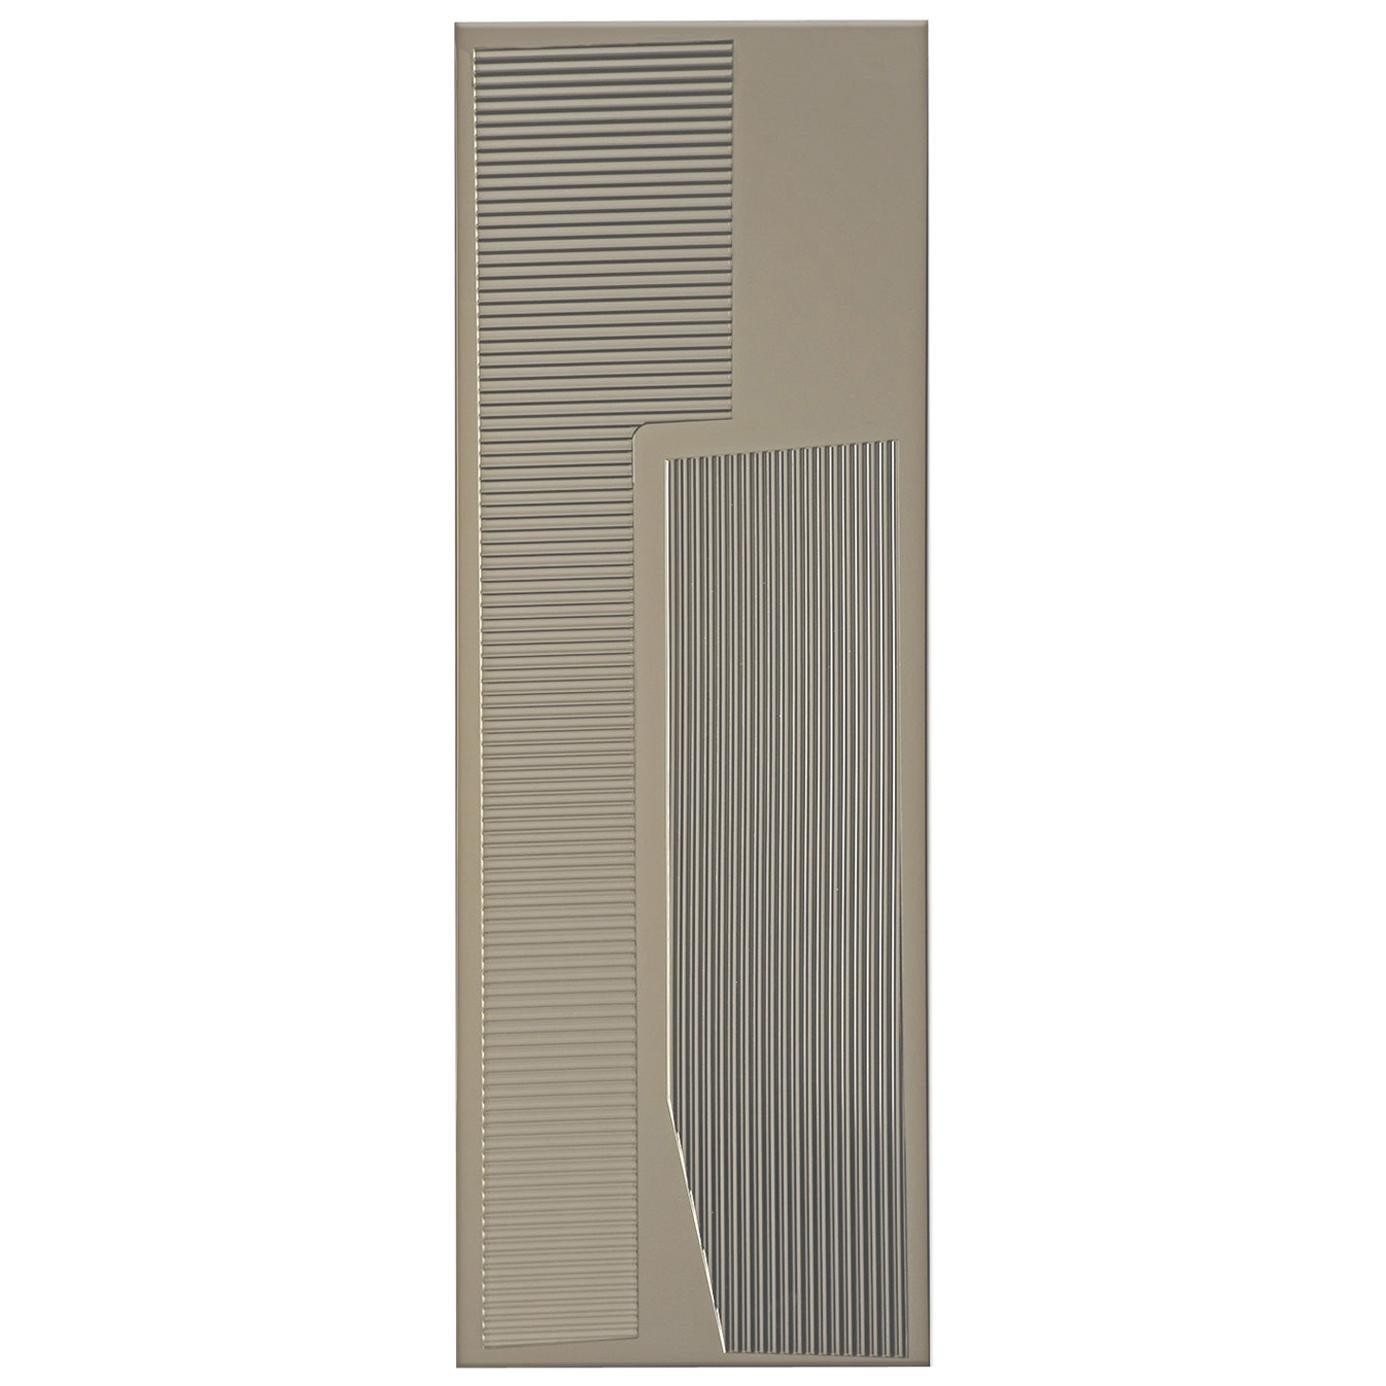 Prisma N02, 21st Century Rectangular Wall Bronzed Mirror